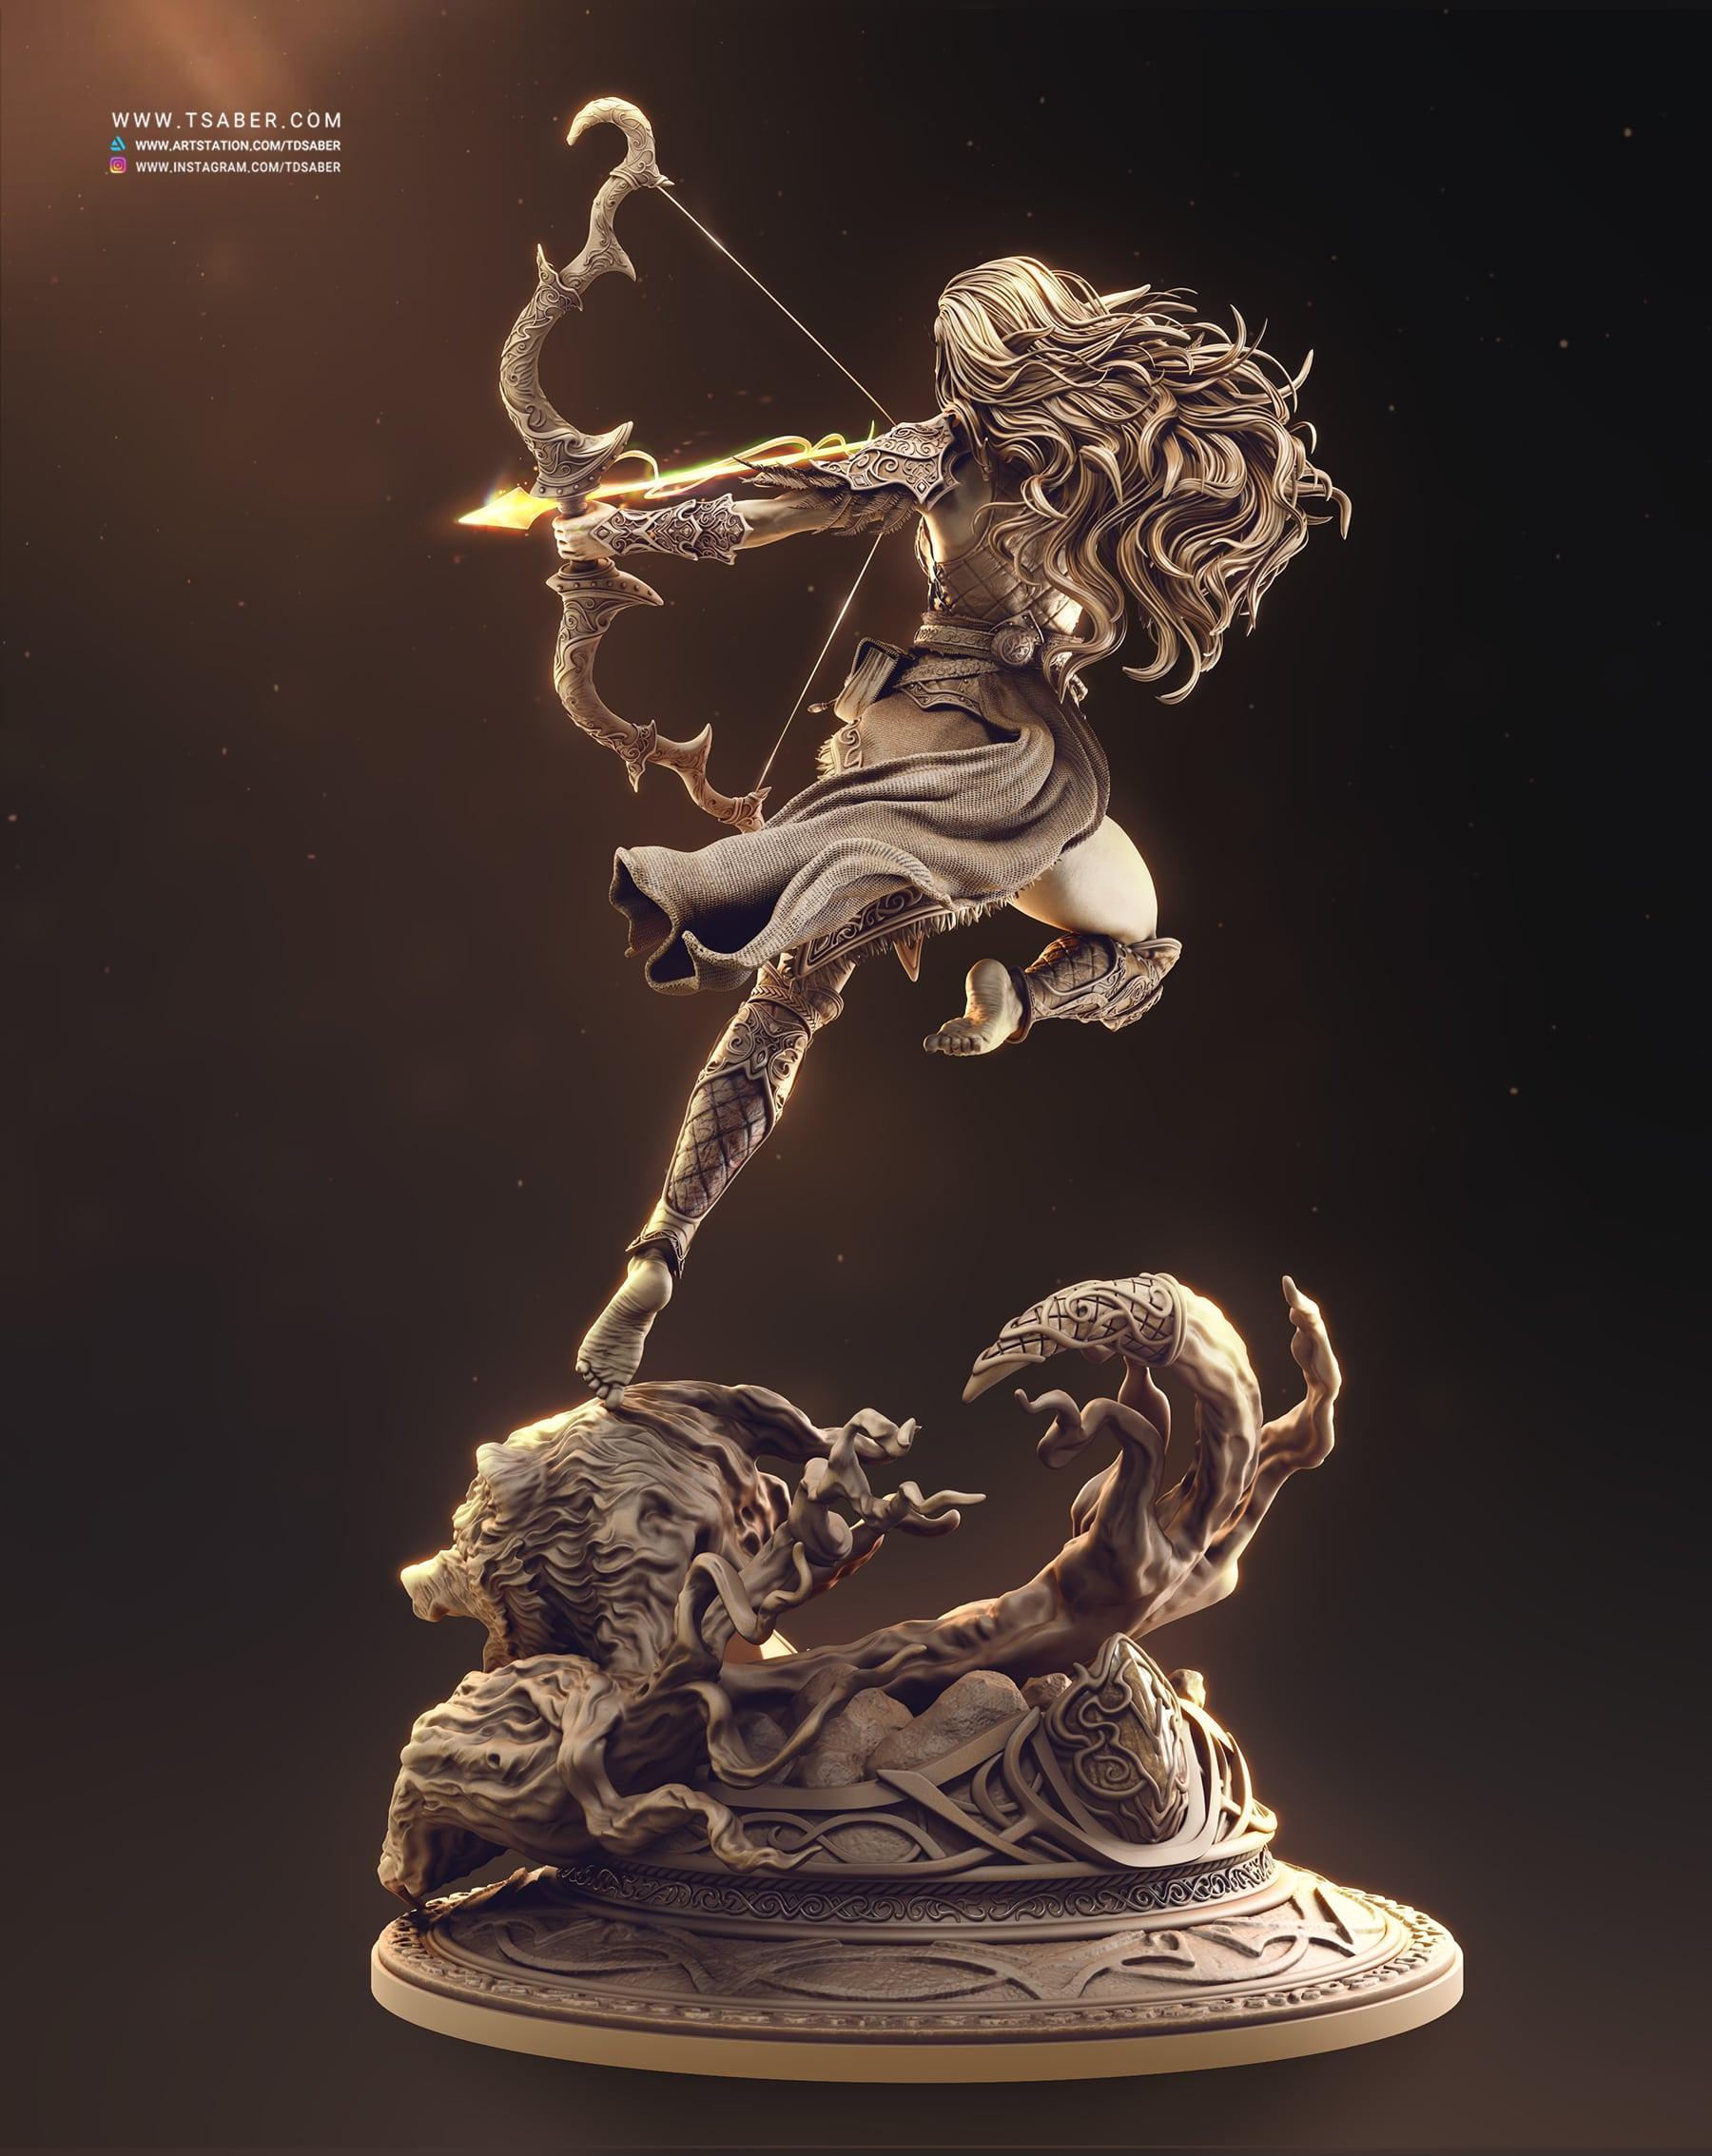 Night Elf Archer - Sculpture collectible - Tsaber